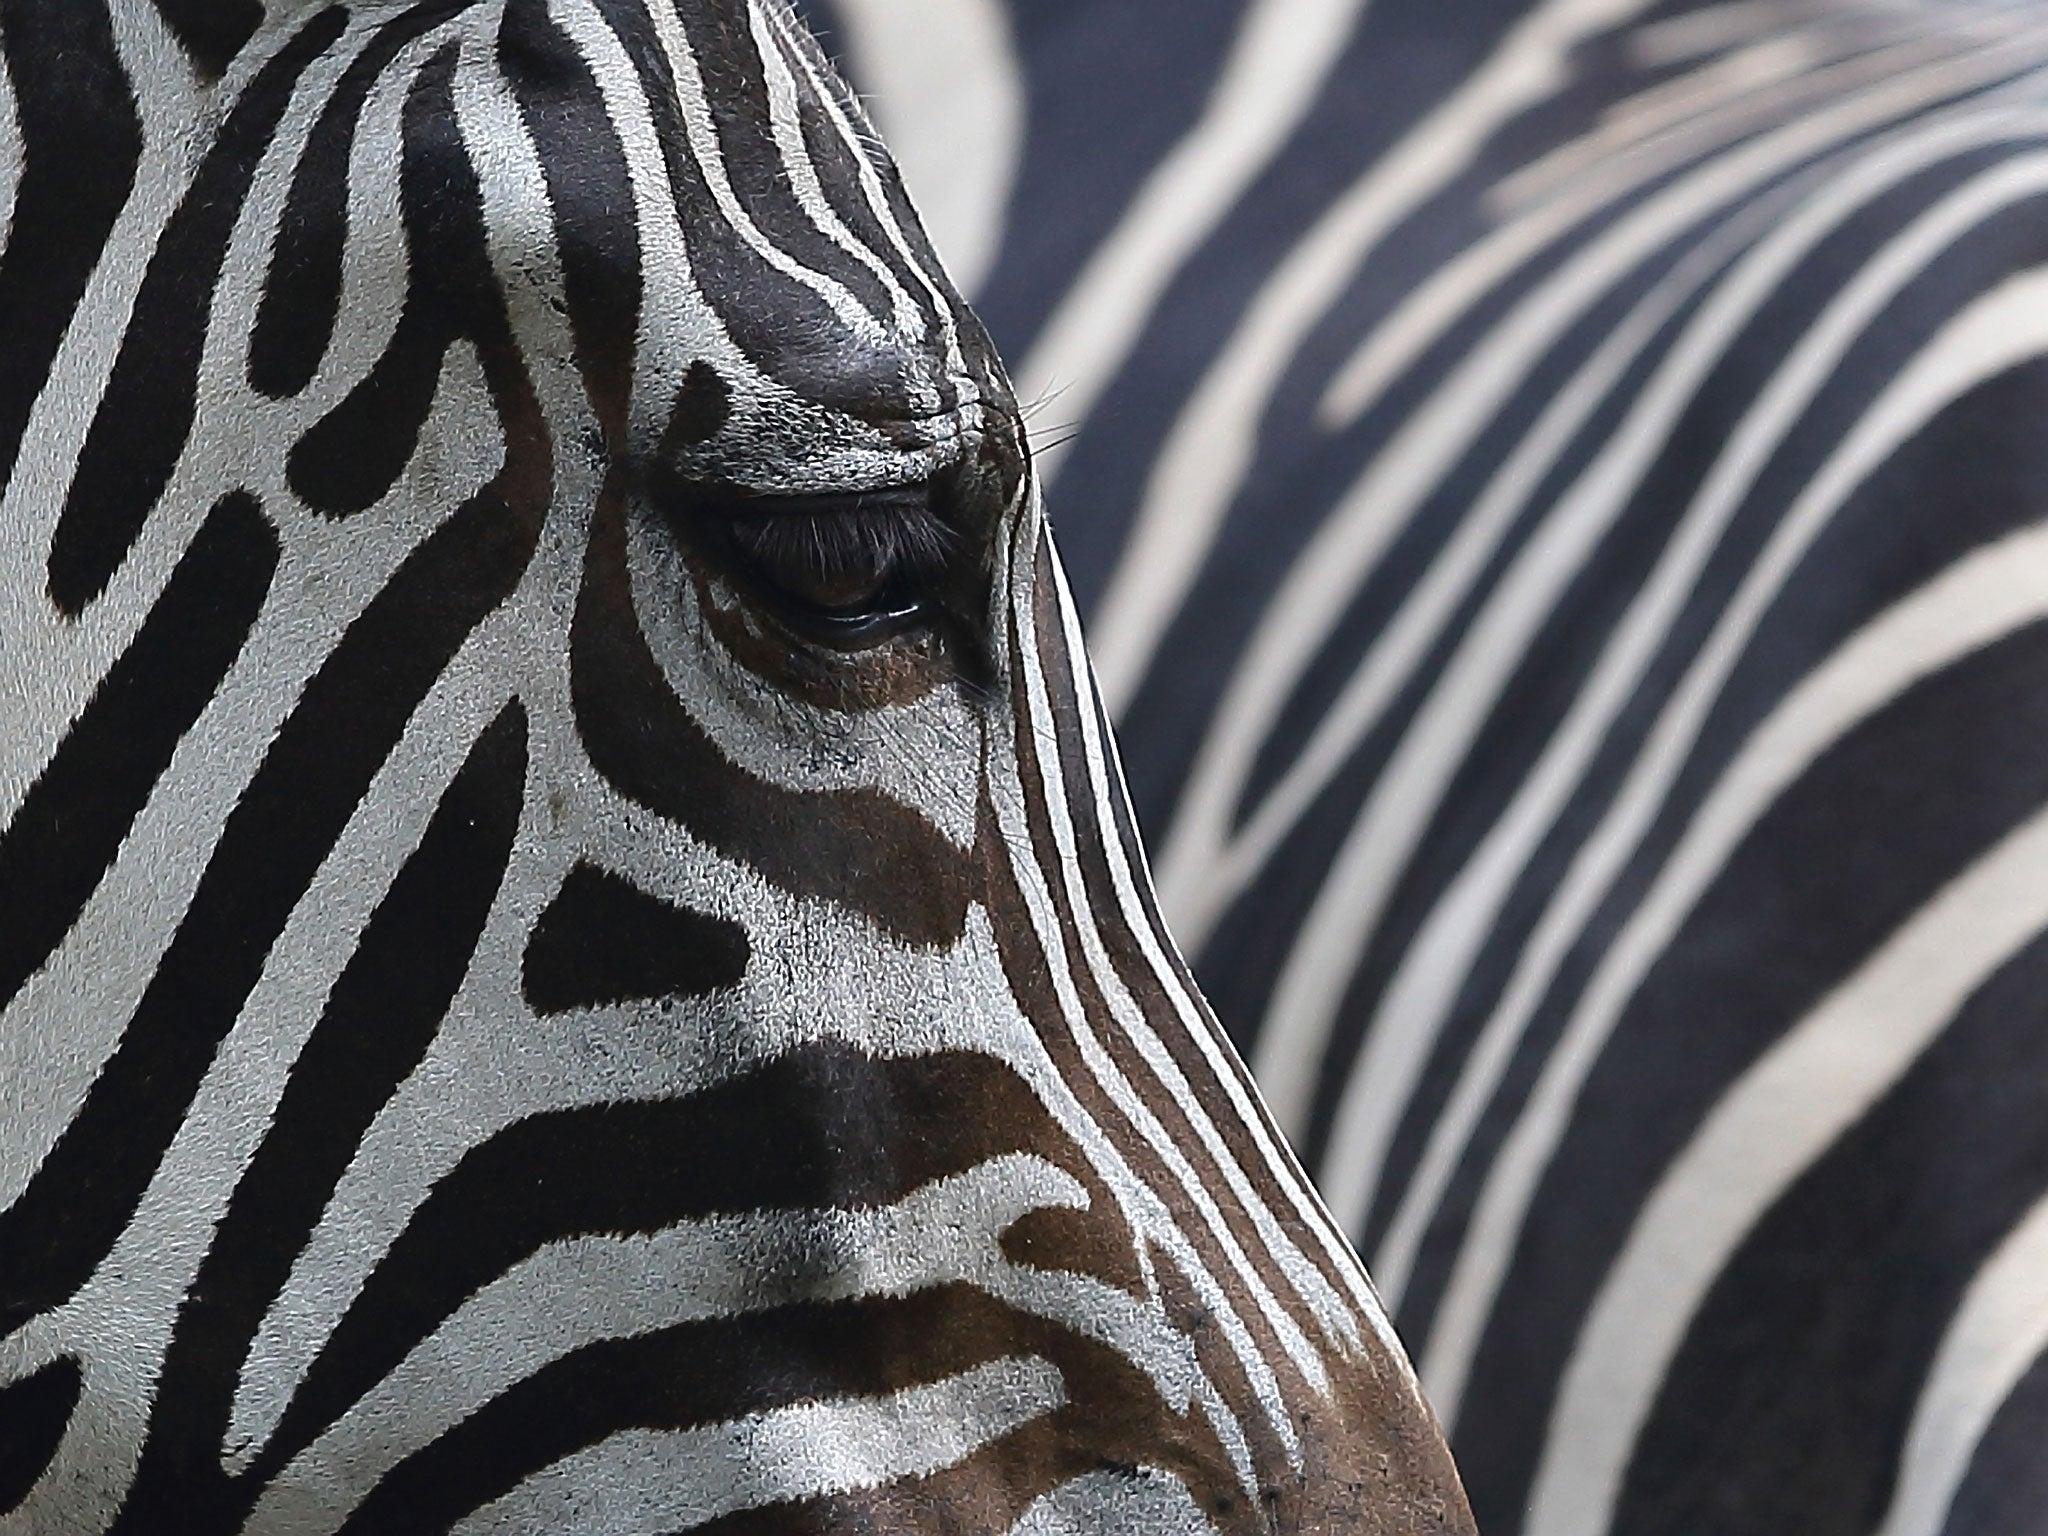 Zebra stripes explained | The Independent